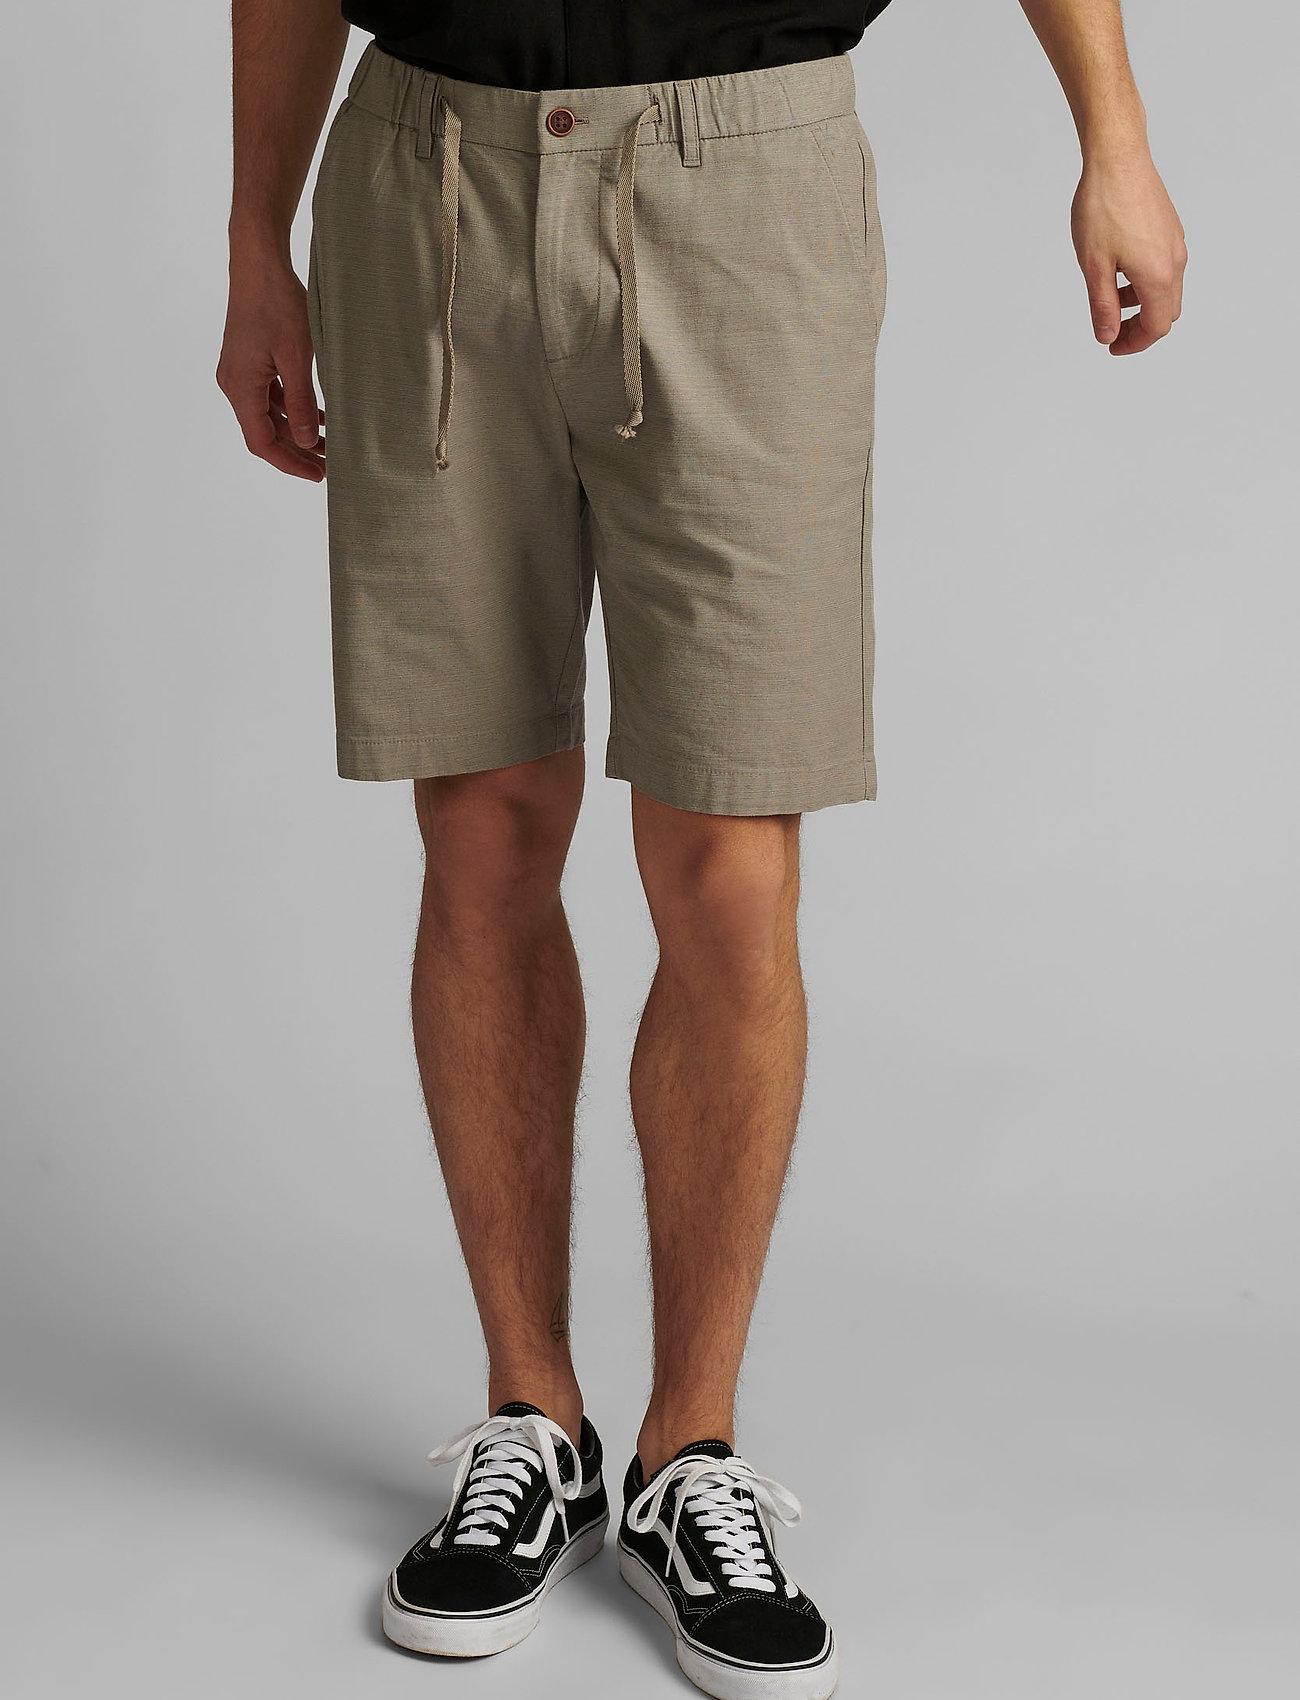 Anerkjendt - AKJENS LT ELASTIC SHORTS - casual shorts - brindle - 0